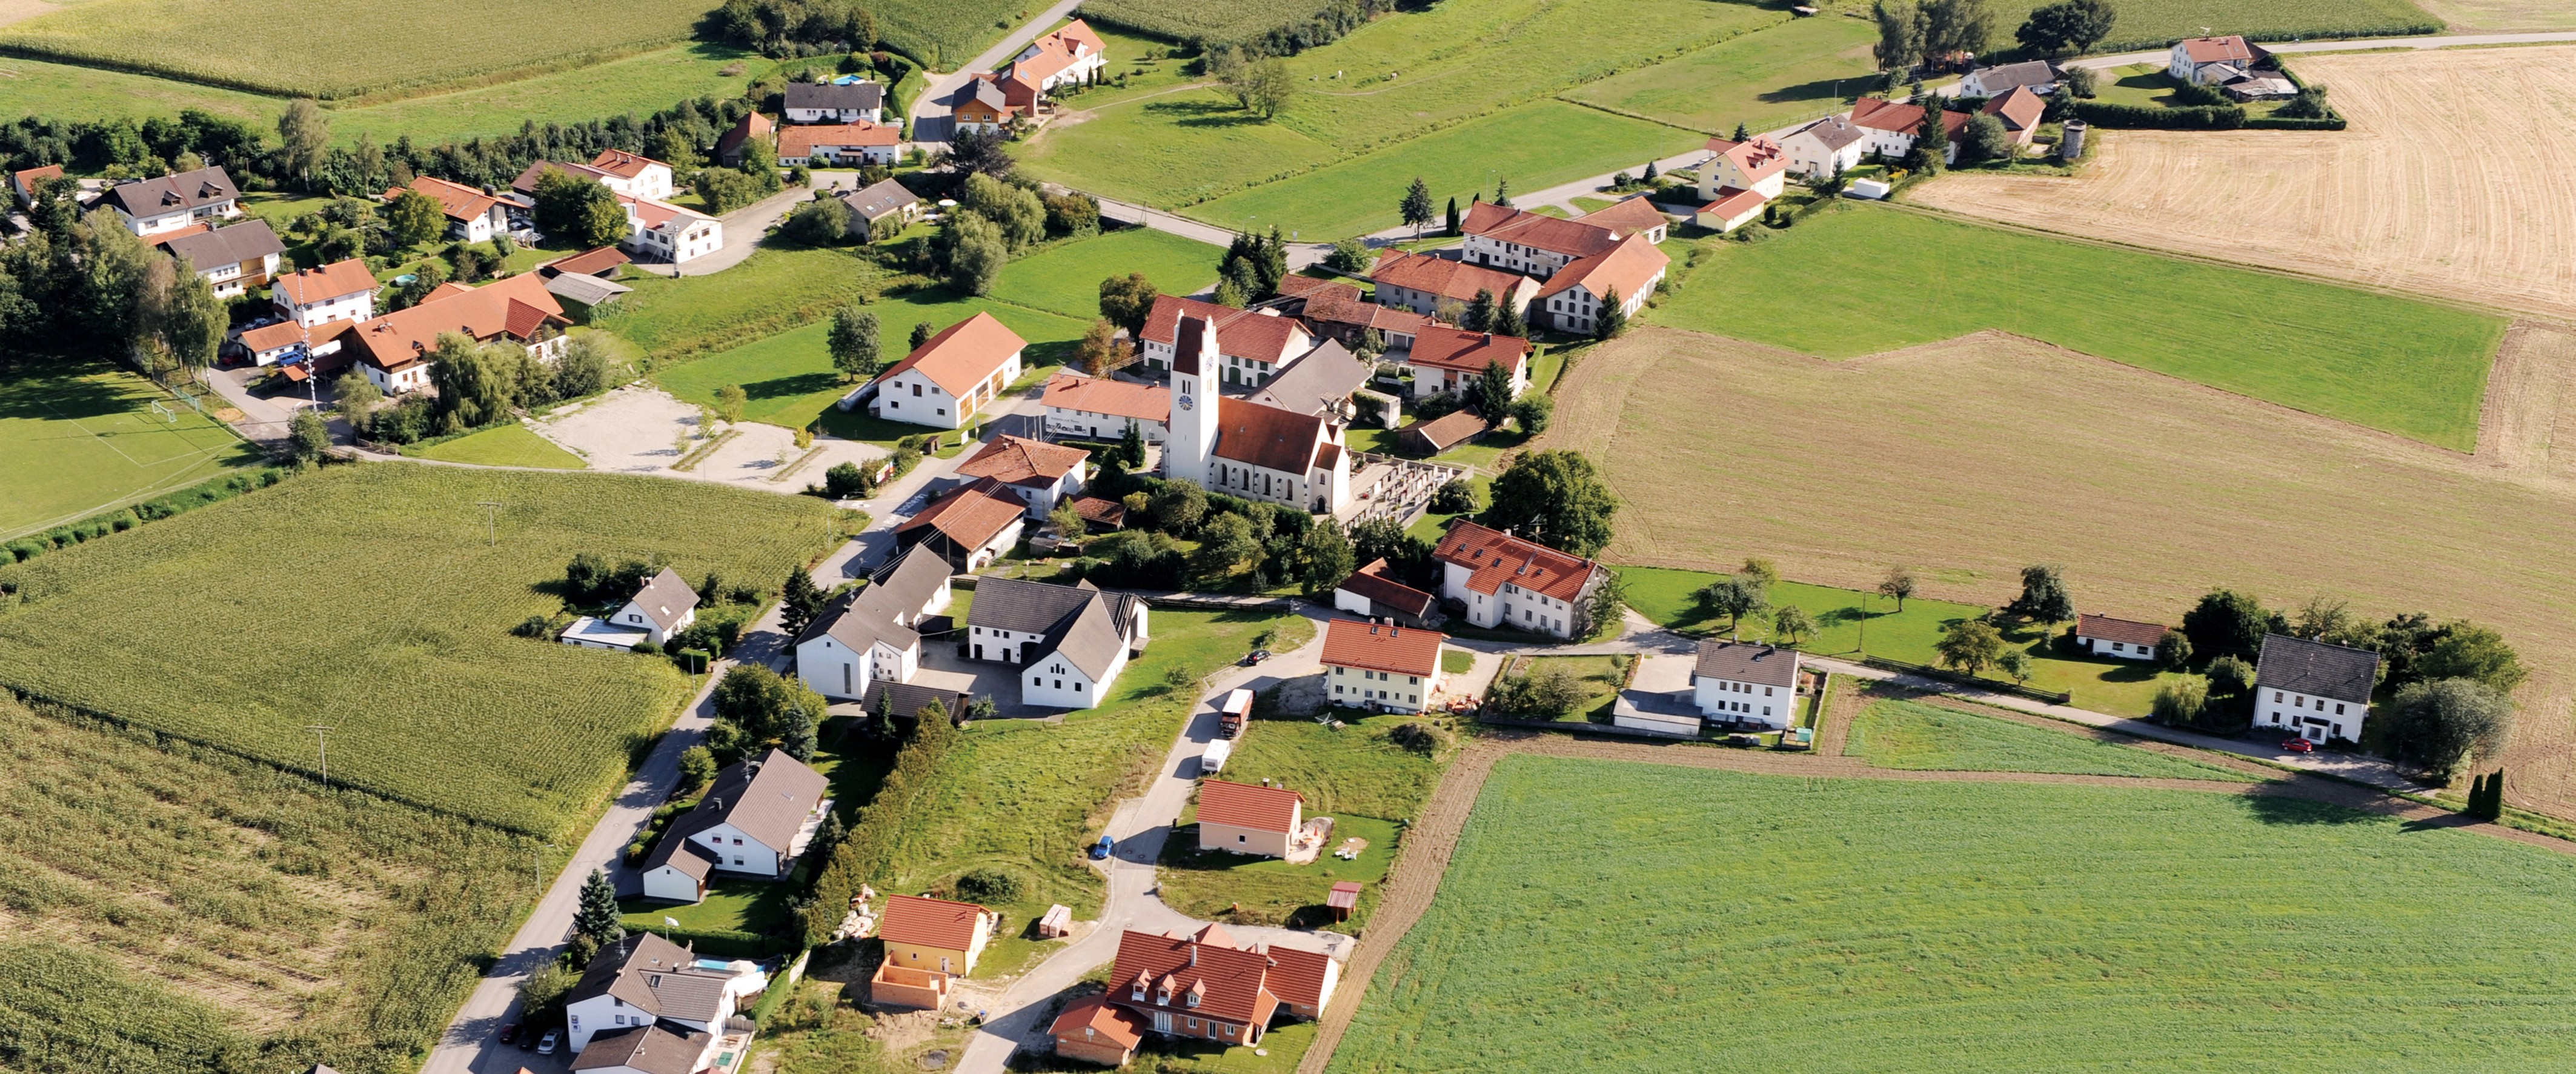 Ortschaft Gebensbach